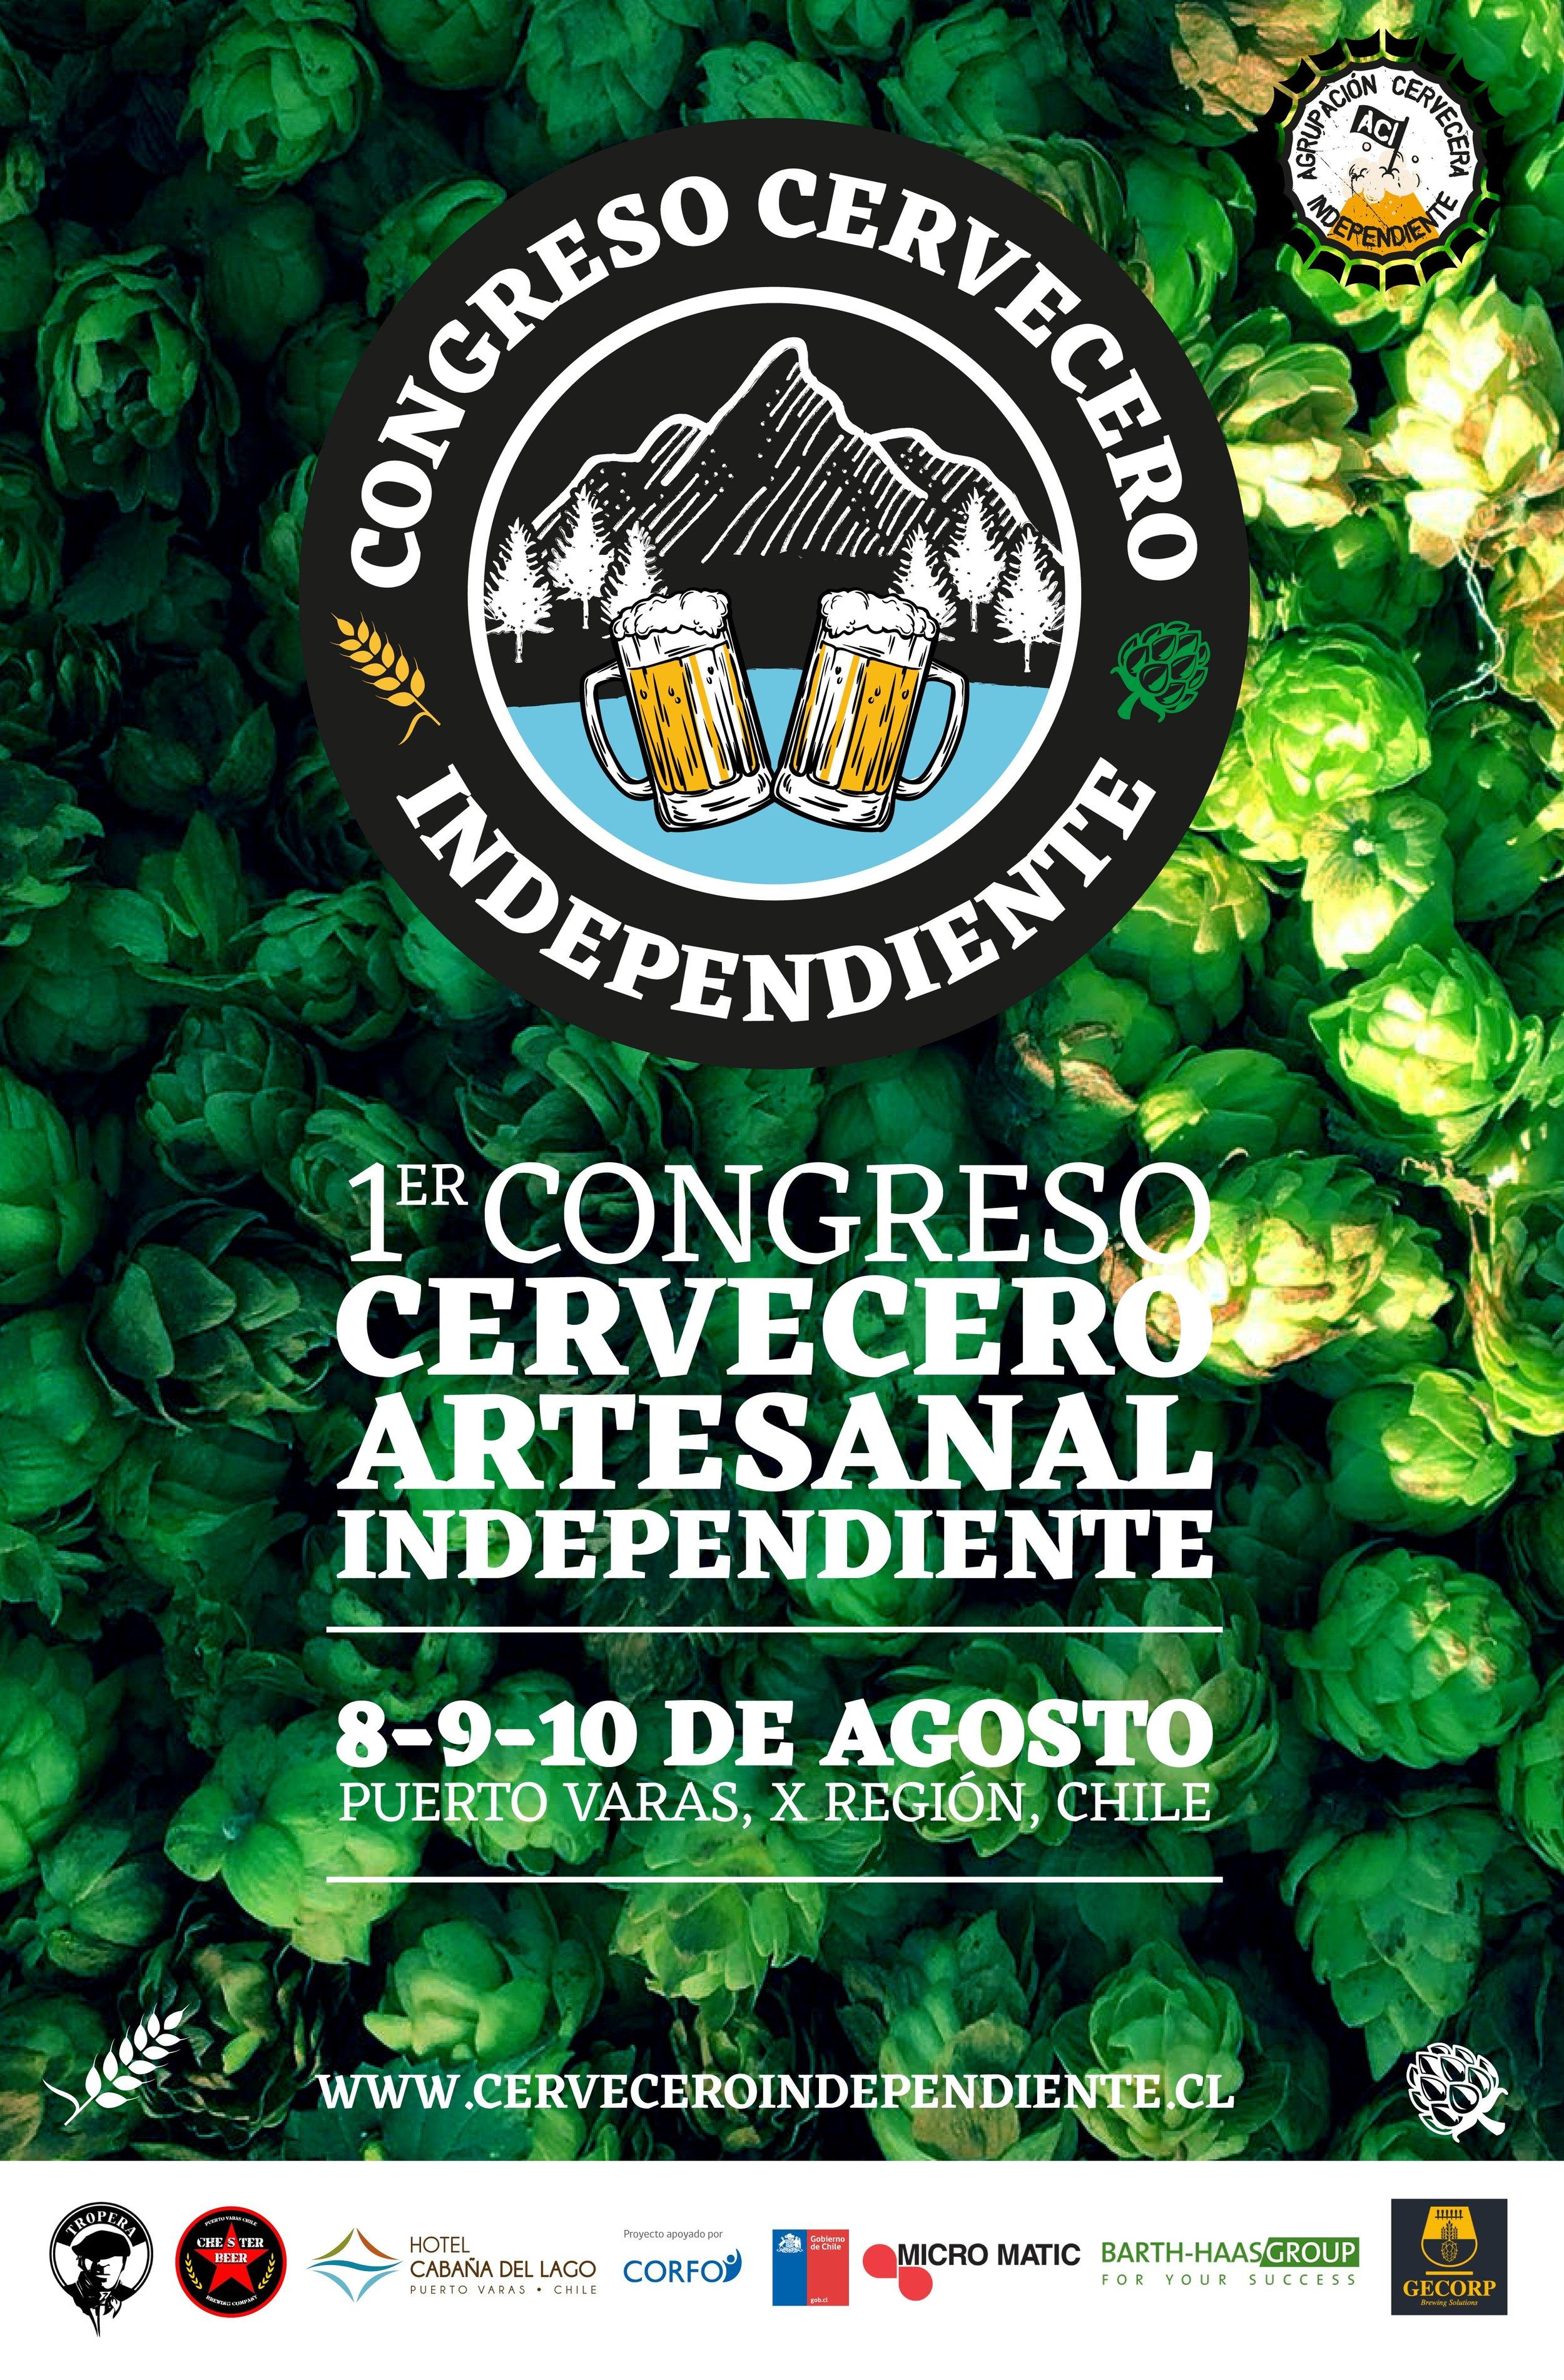 1er Congreso Cervecero Artesanal Independiente